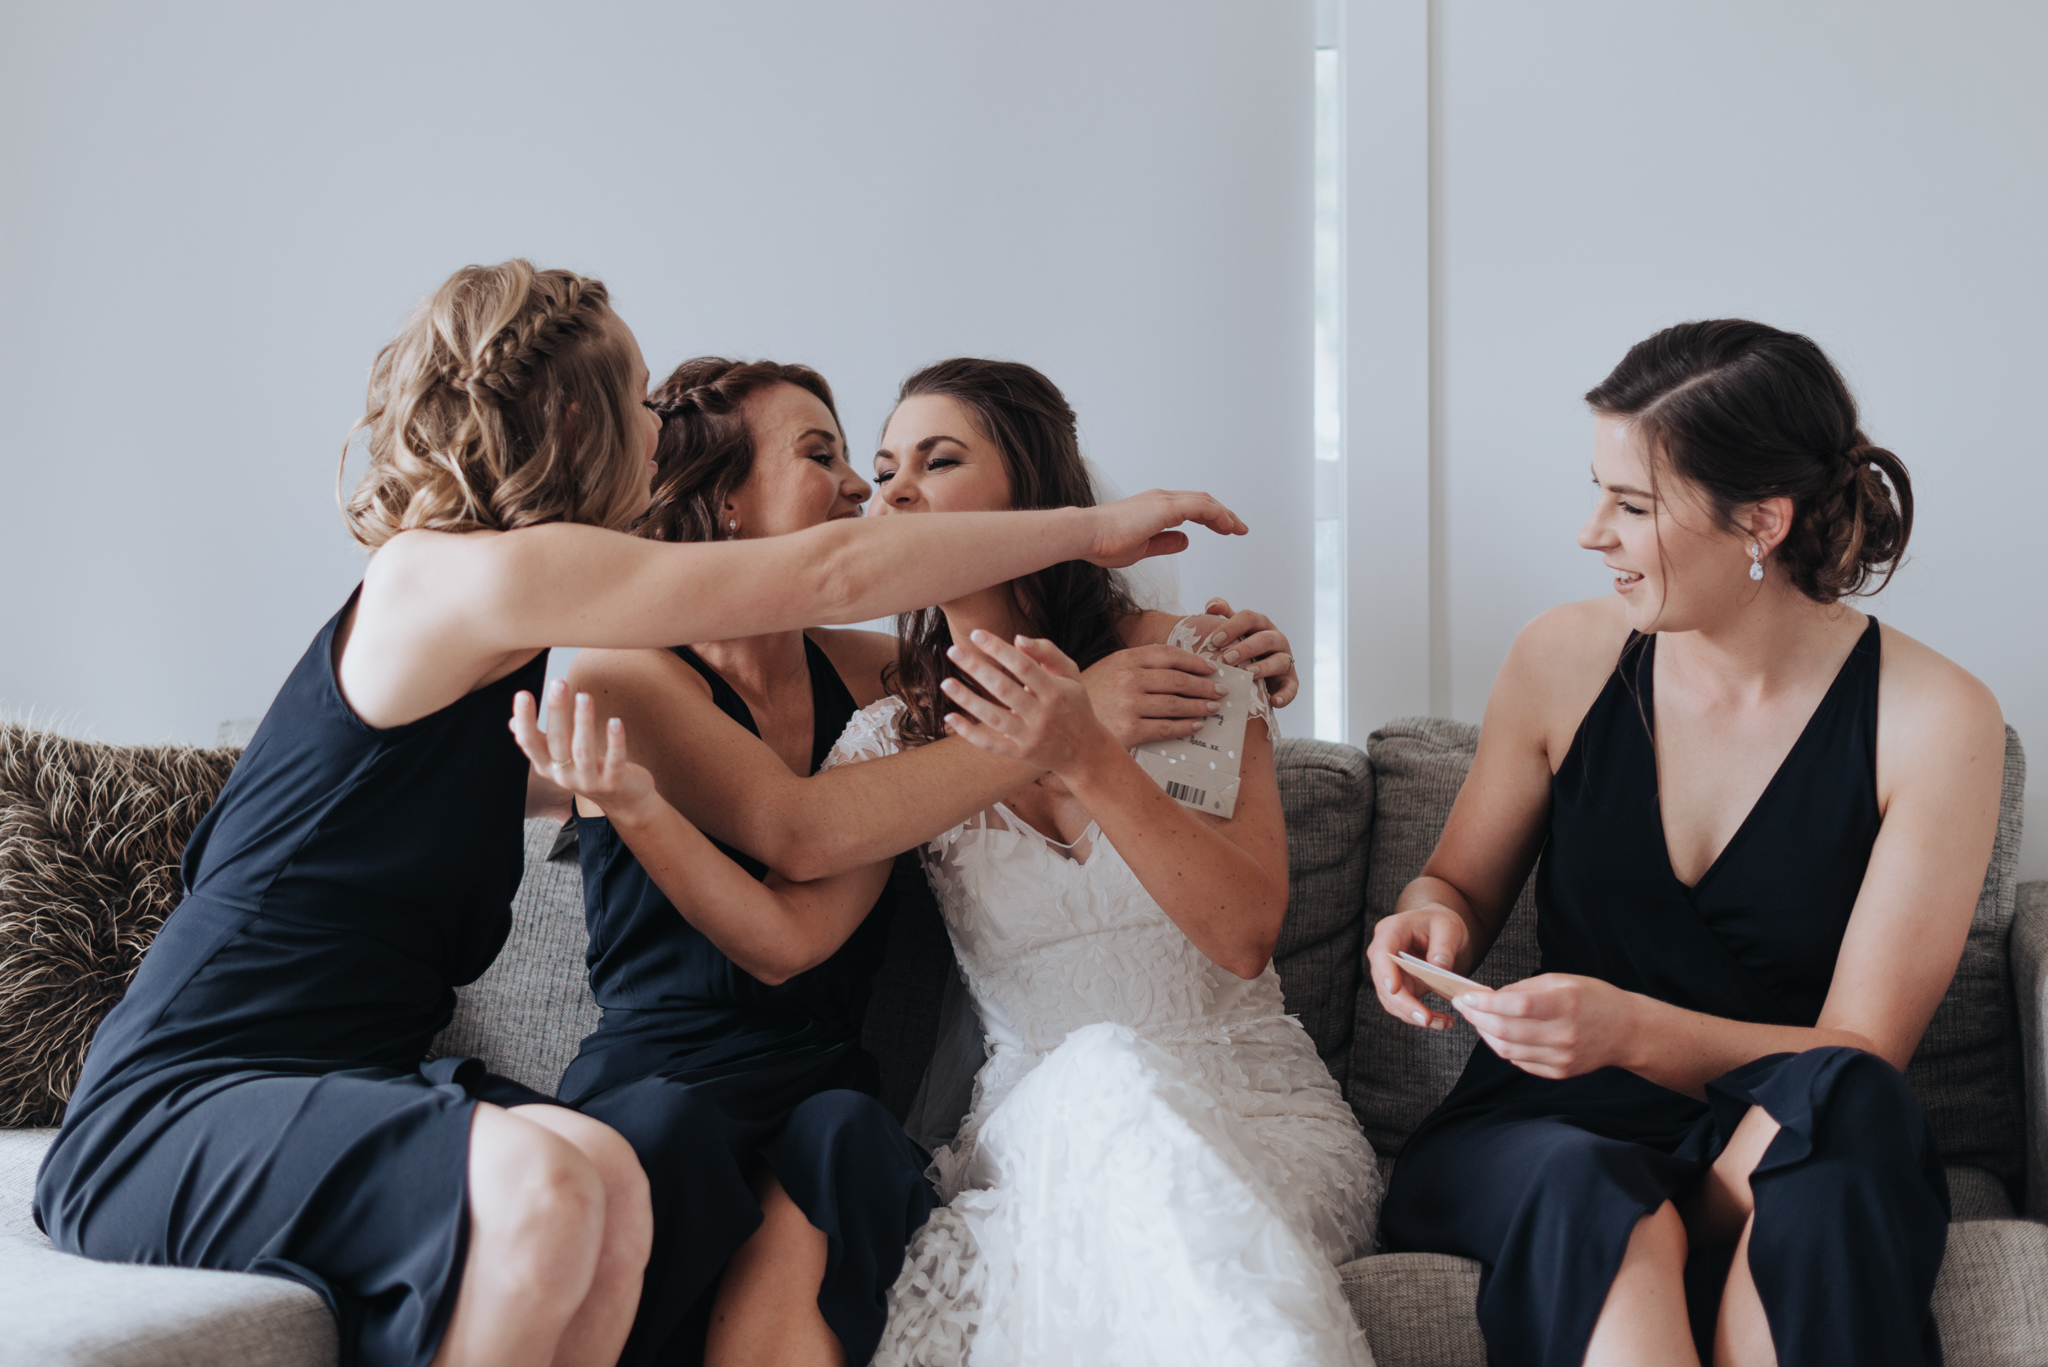 LOVELENSCAPES PHOTOGRAPHY • VISUAL POETRY • NEW ZEALAND WEDDING PHOTOGRAPHER • AUSTRALIAN WEDDING PHOTOGRAPHER • BRISBANE • MELBOURNE • SYDNEY • HOBART • TARUREKA ESTATE • ANNA CAMPBELL • 68.jpg